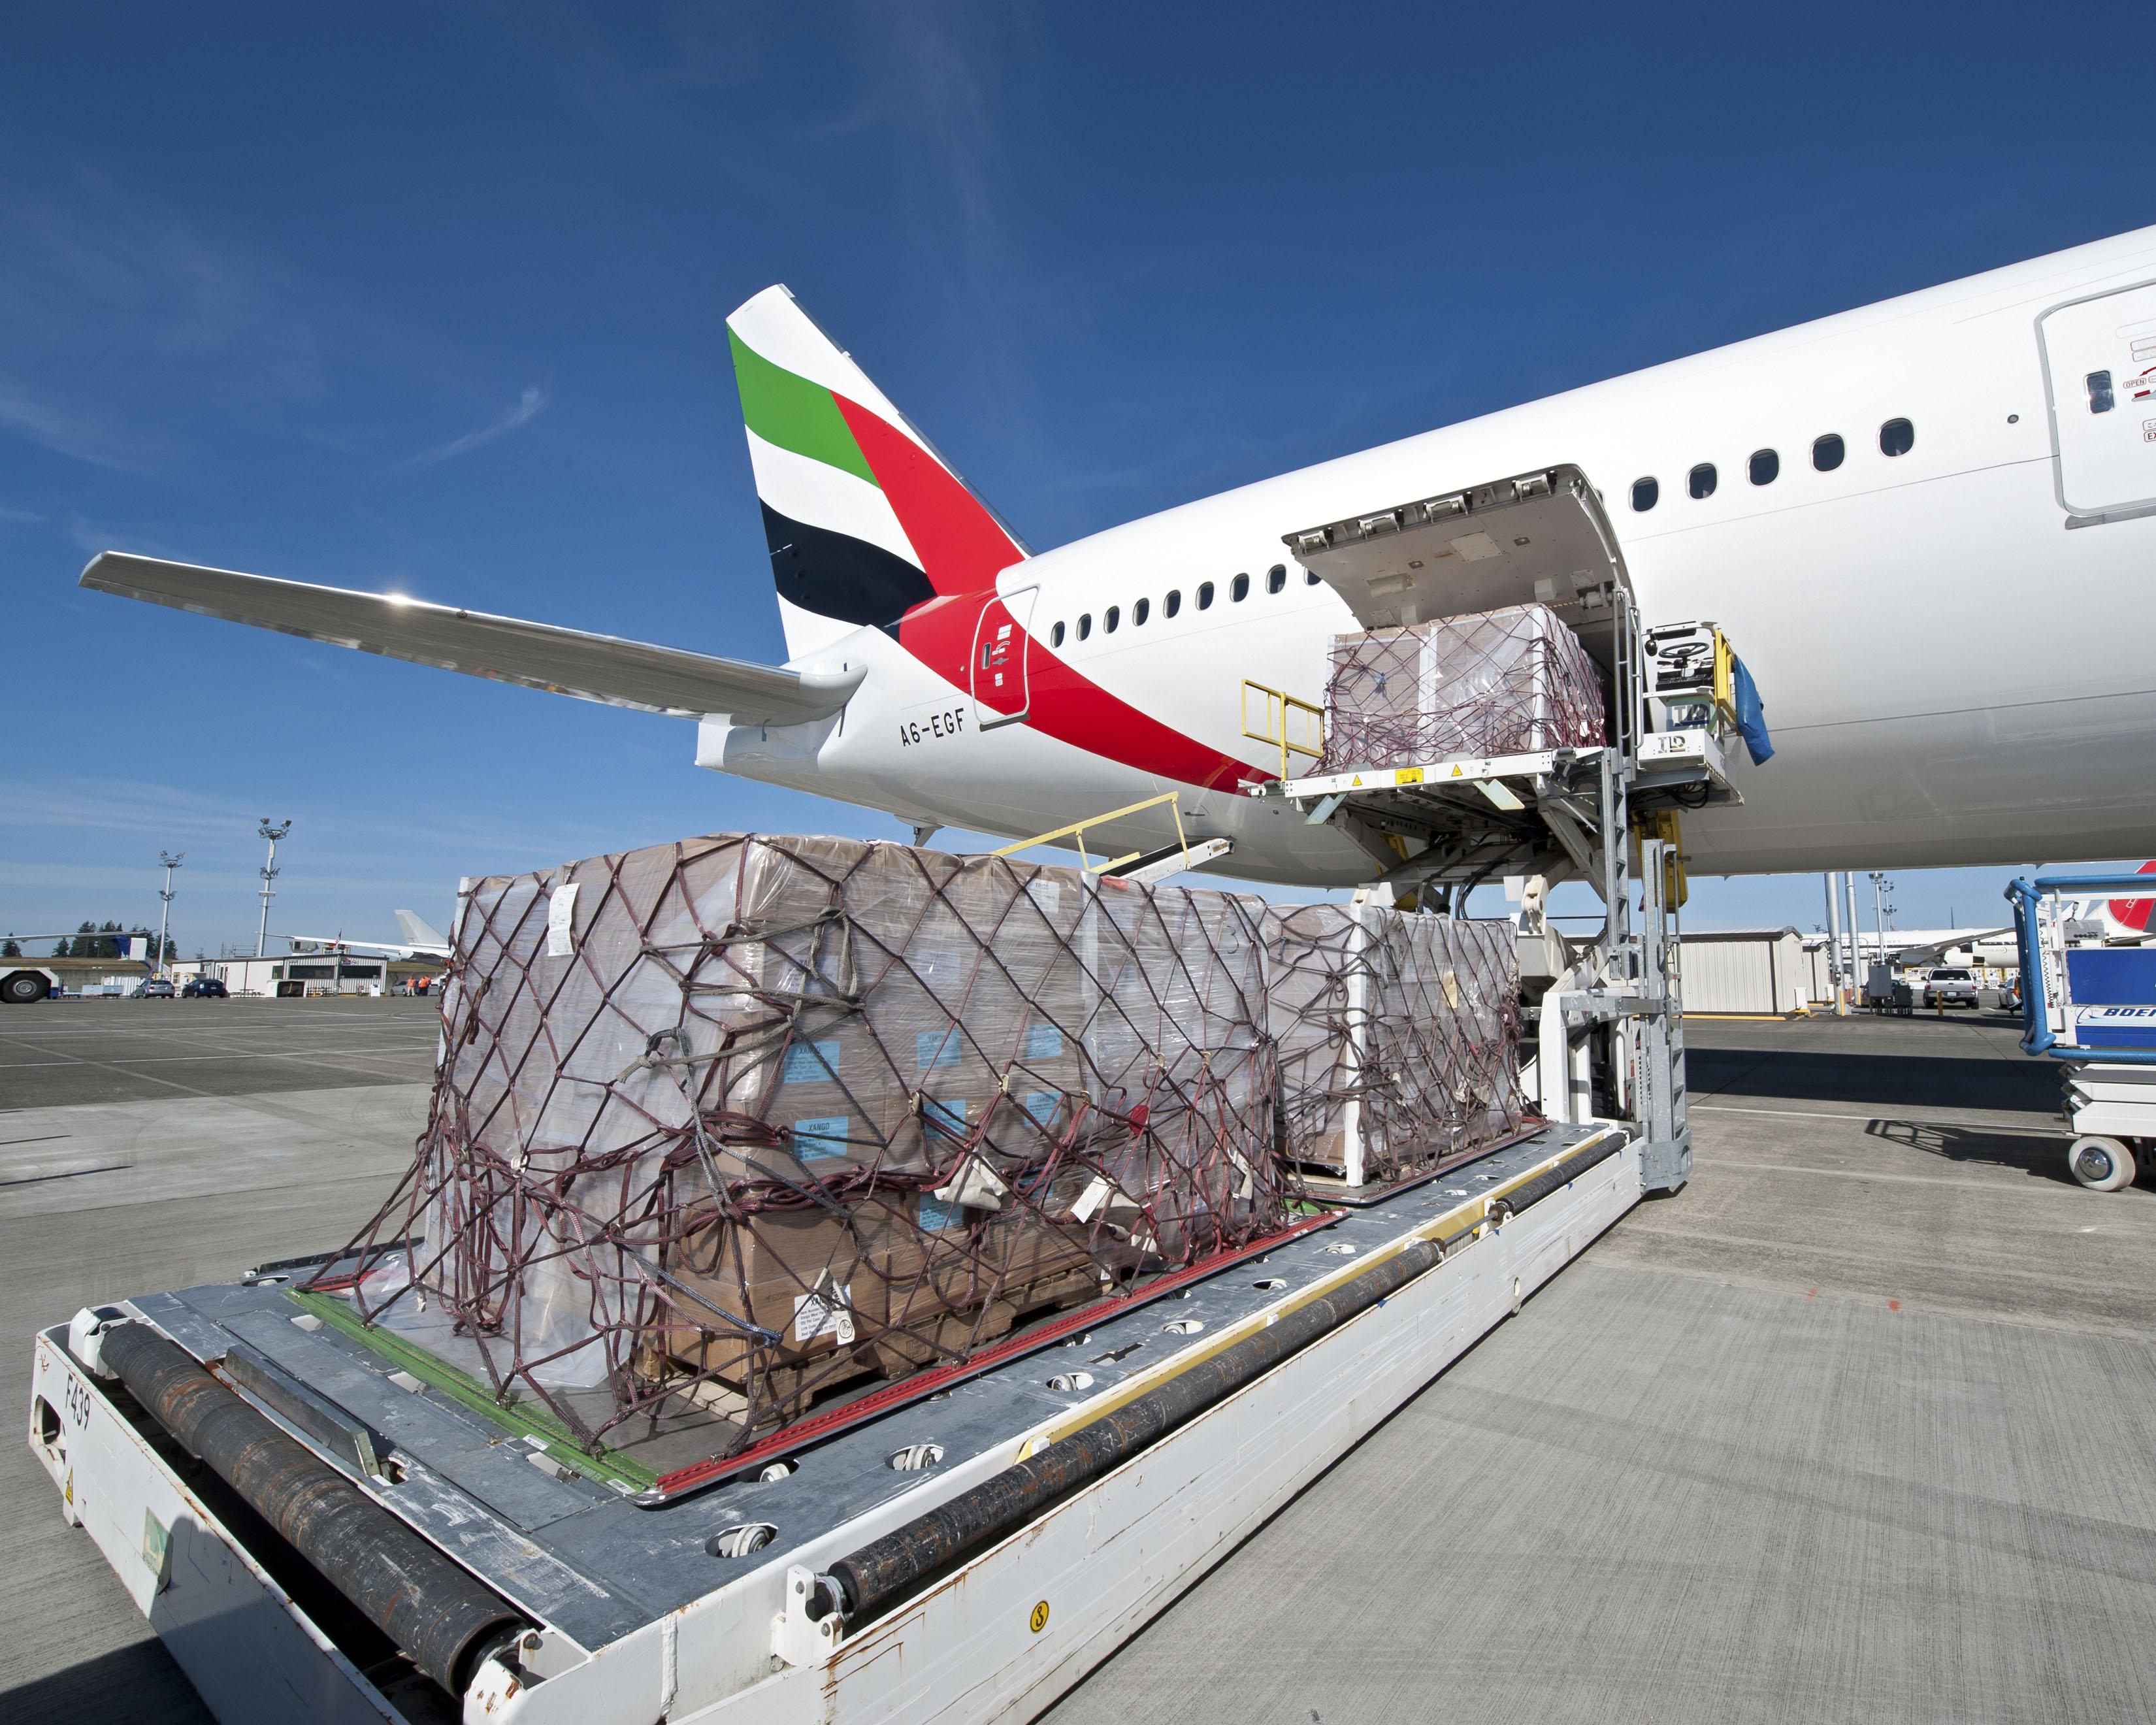 SERVICES - FAIRMACS UAE